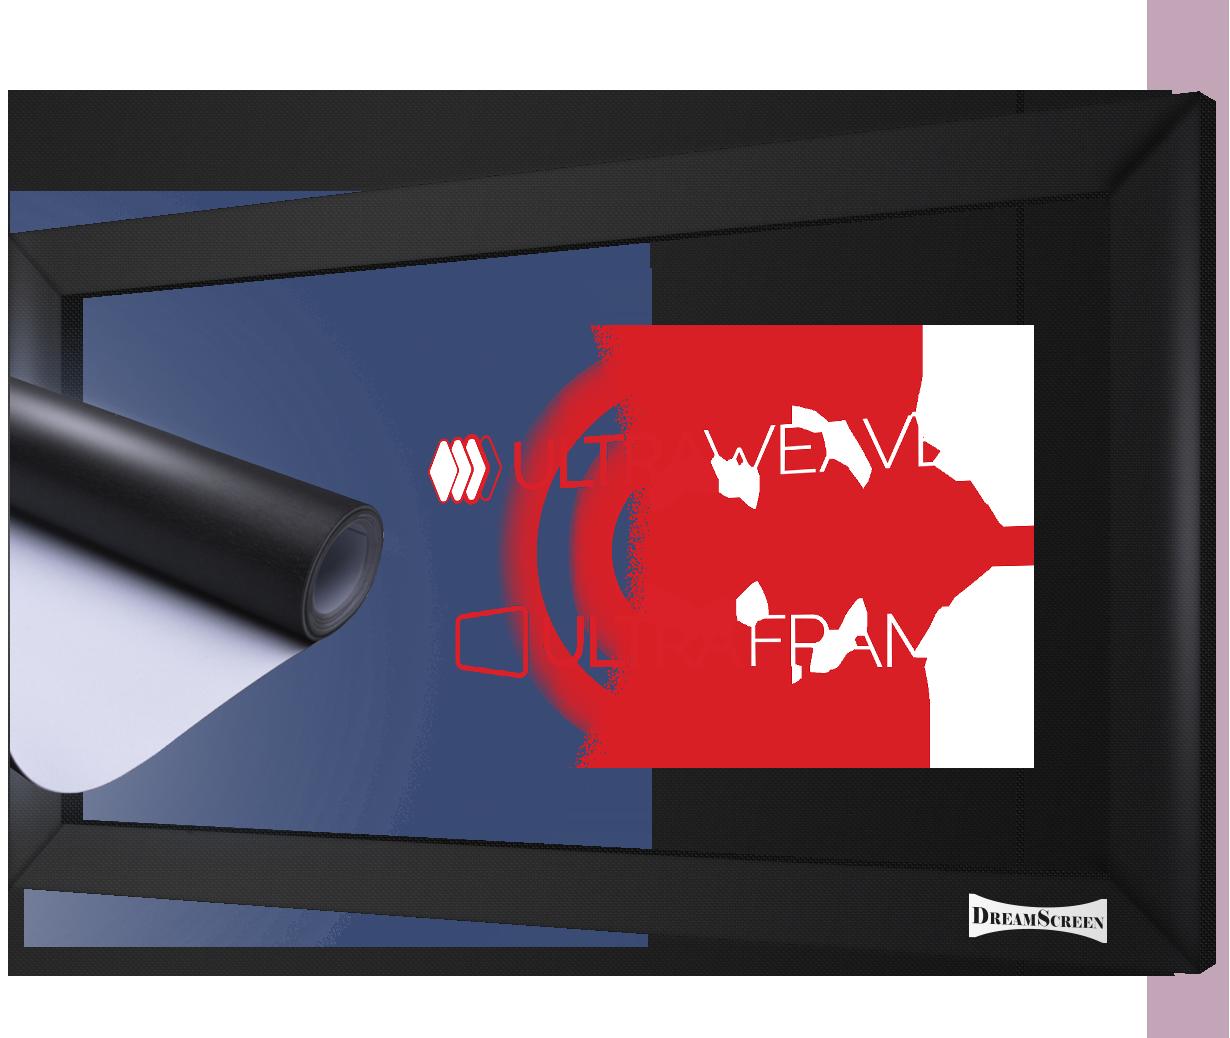 DreamScreen UltraWeave v7 med UltraFrame 3,9m bildebredde 2.40:1 -DEMO!-